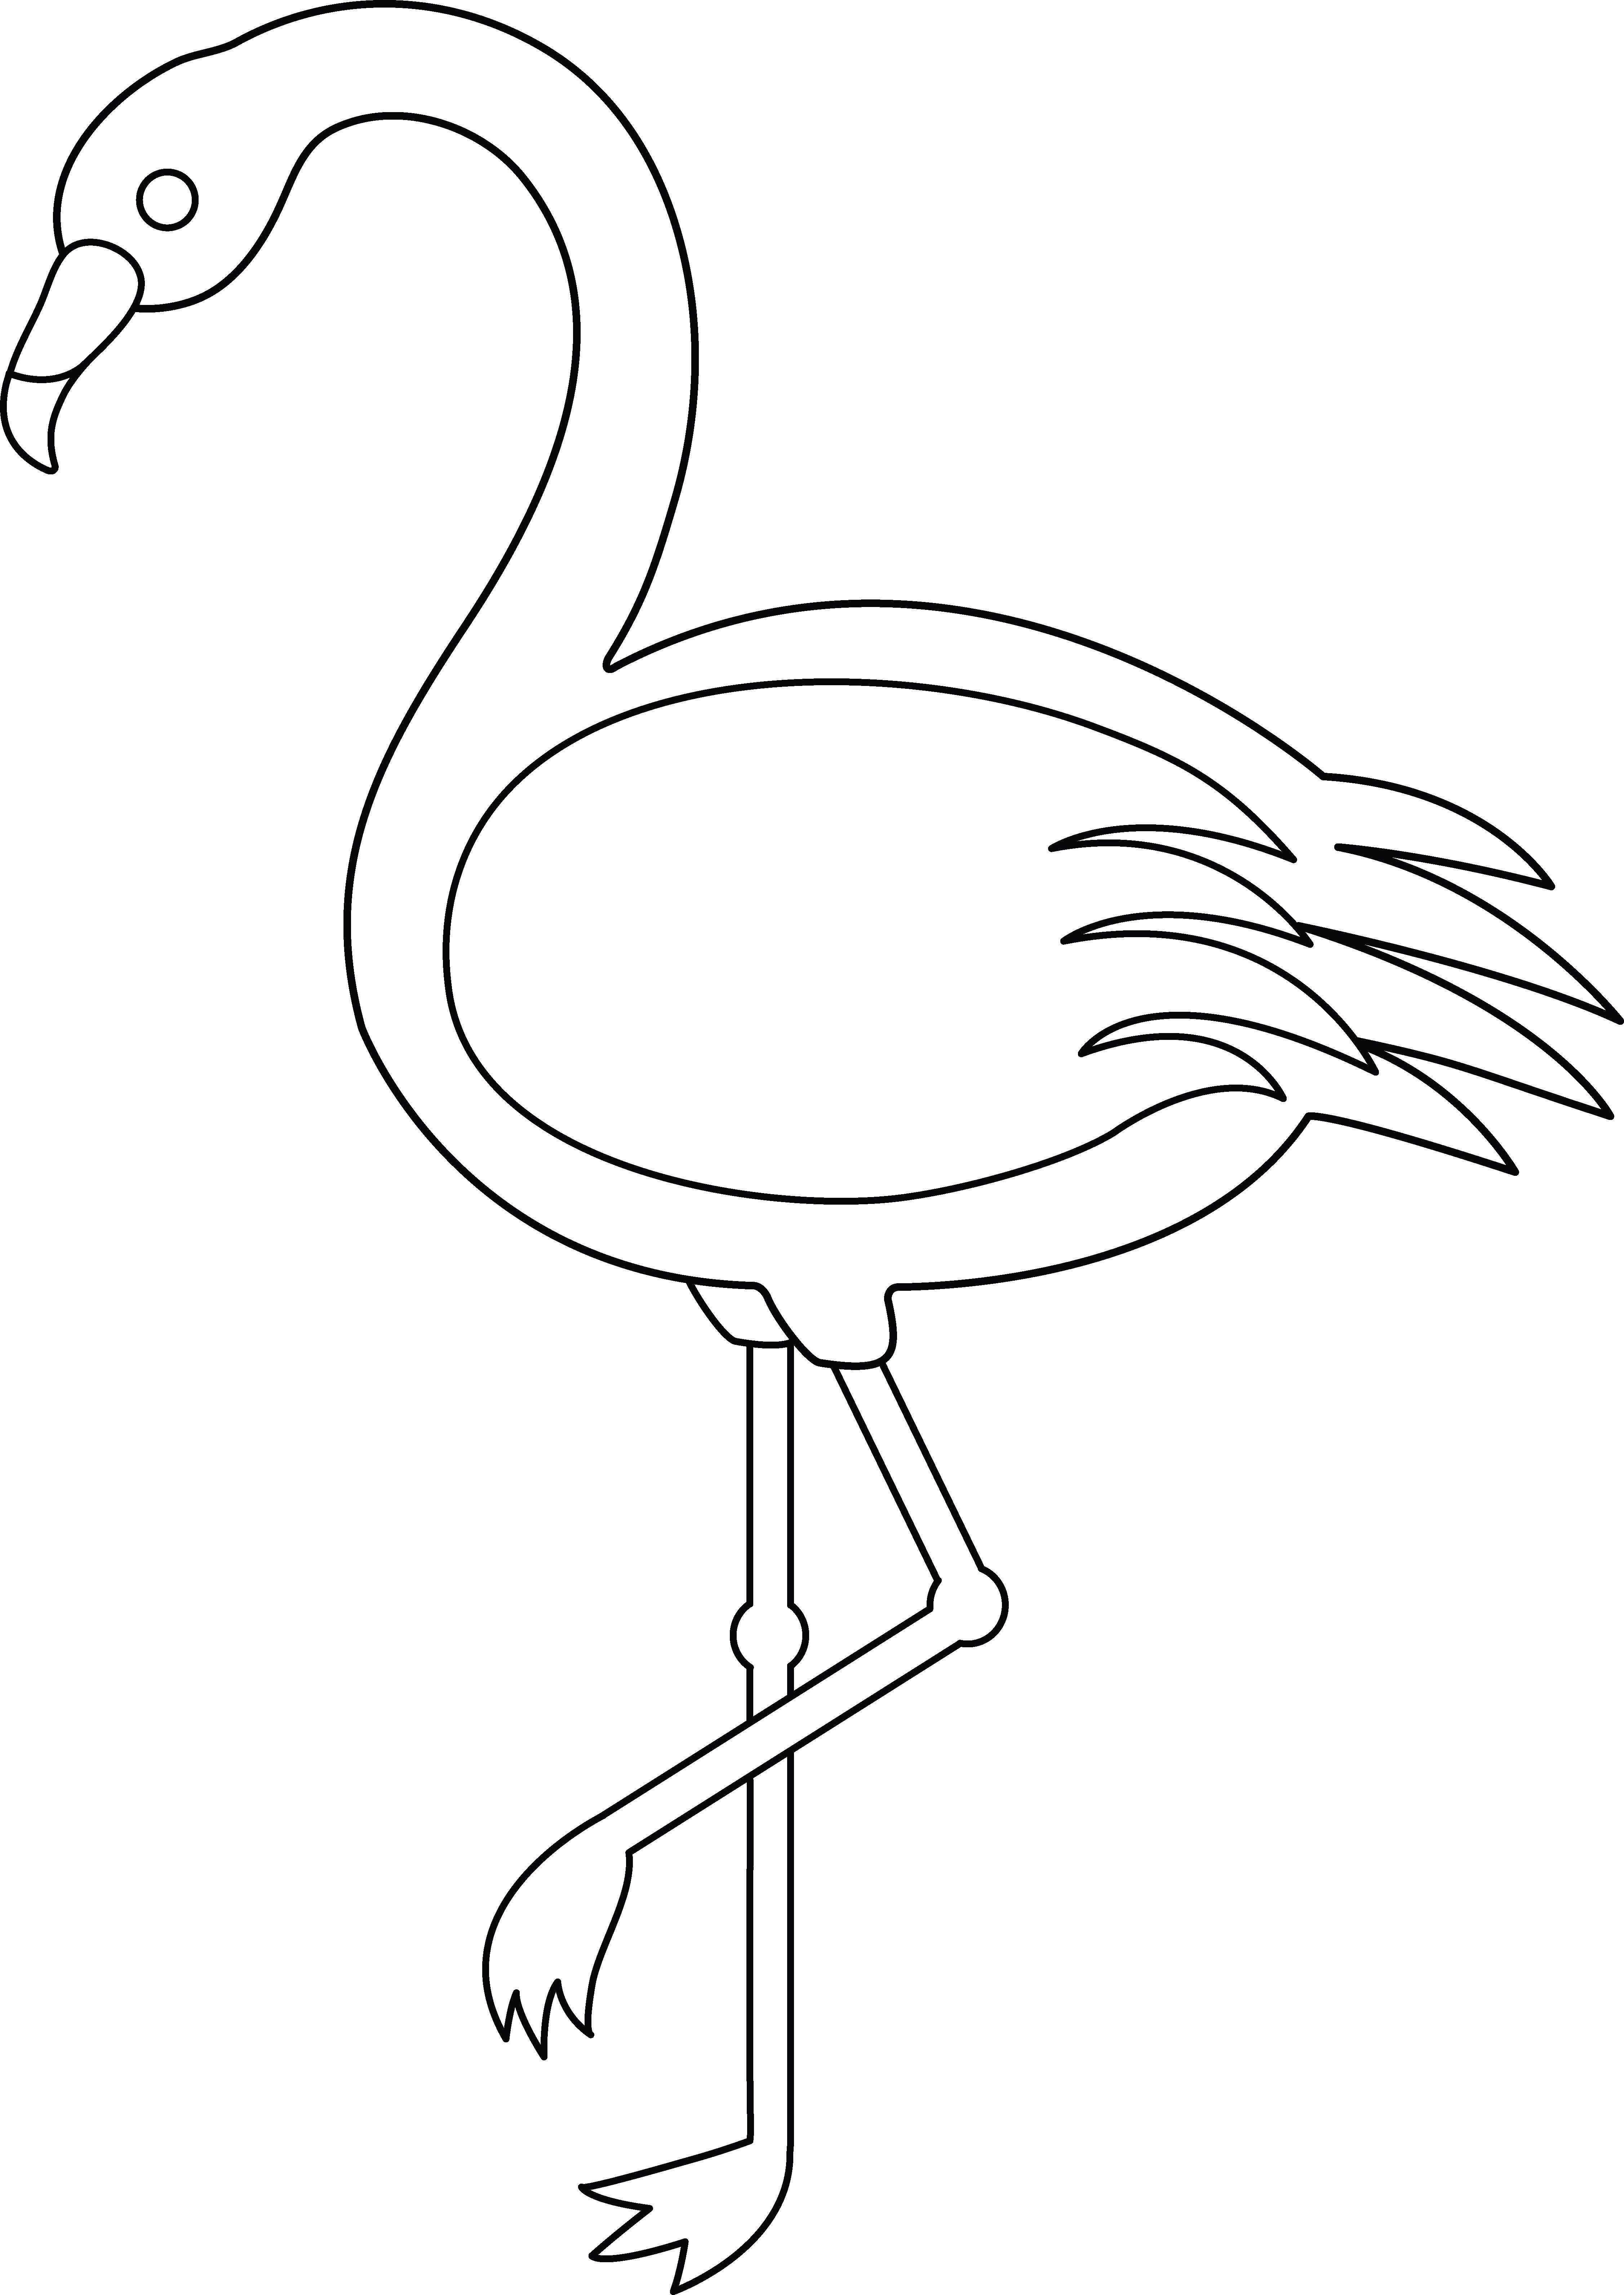 flamingo malvorlagen cute flamingo malvorlagen futurama